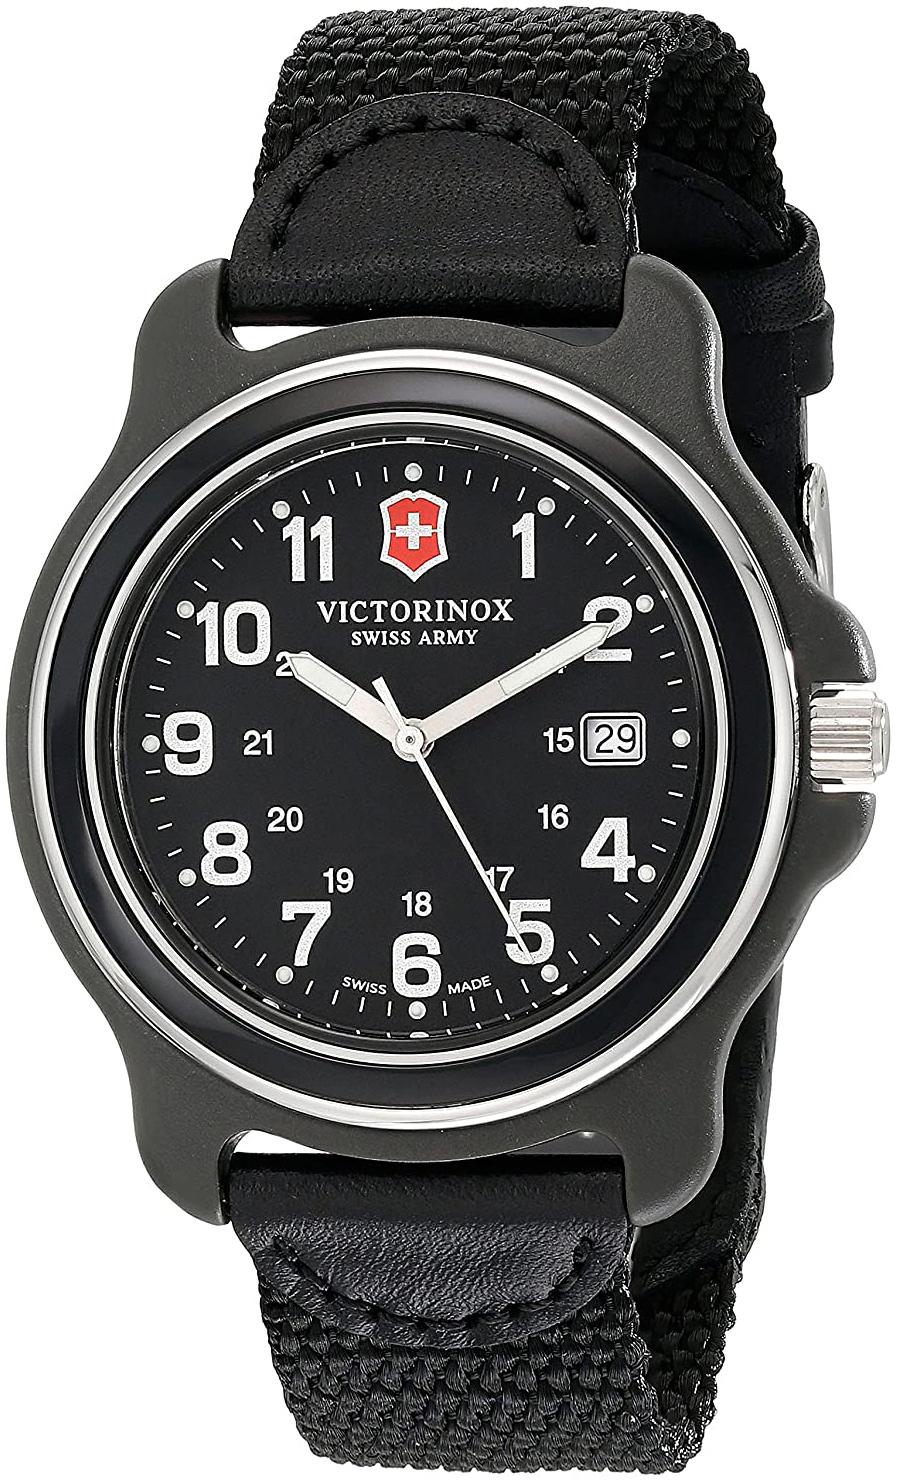 Victorinox 99999 Herrklocka 249087 Svart/Textil Ø43 mm - Victorinox